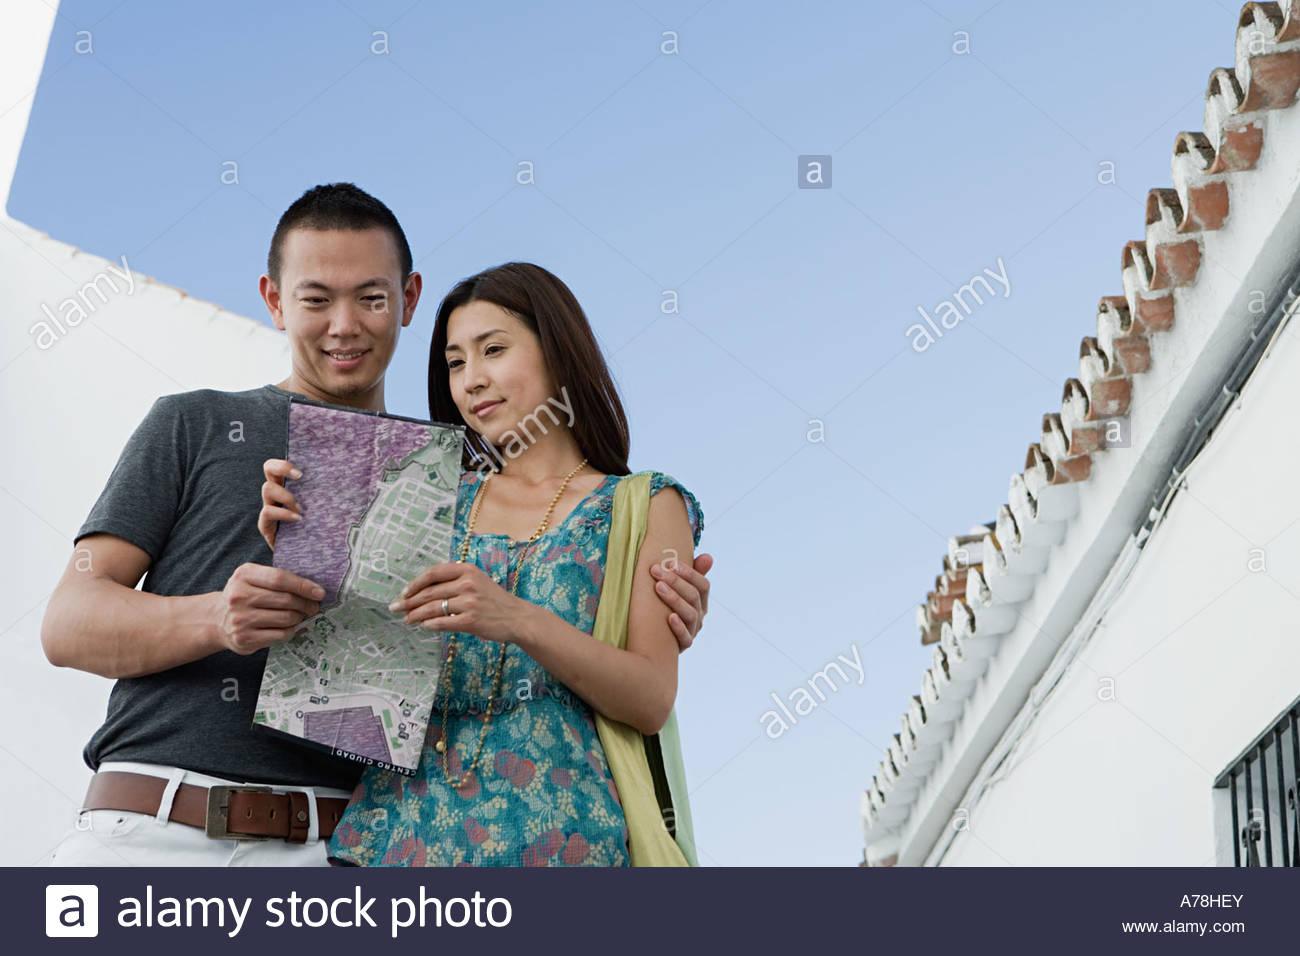 Pareja mirando el mapa Imagen De Stock